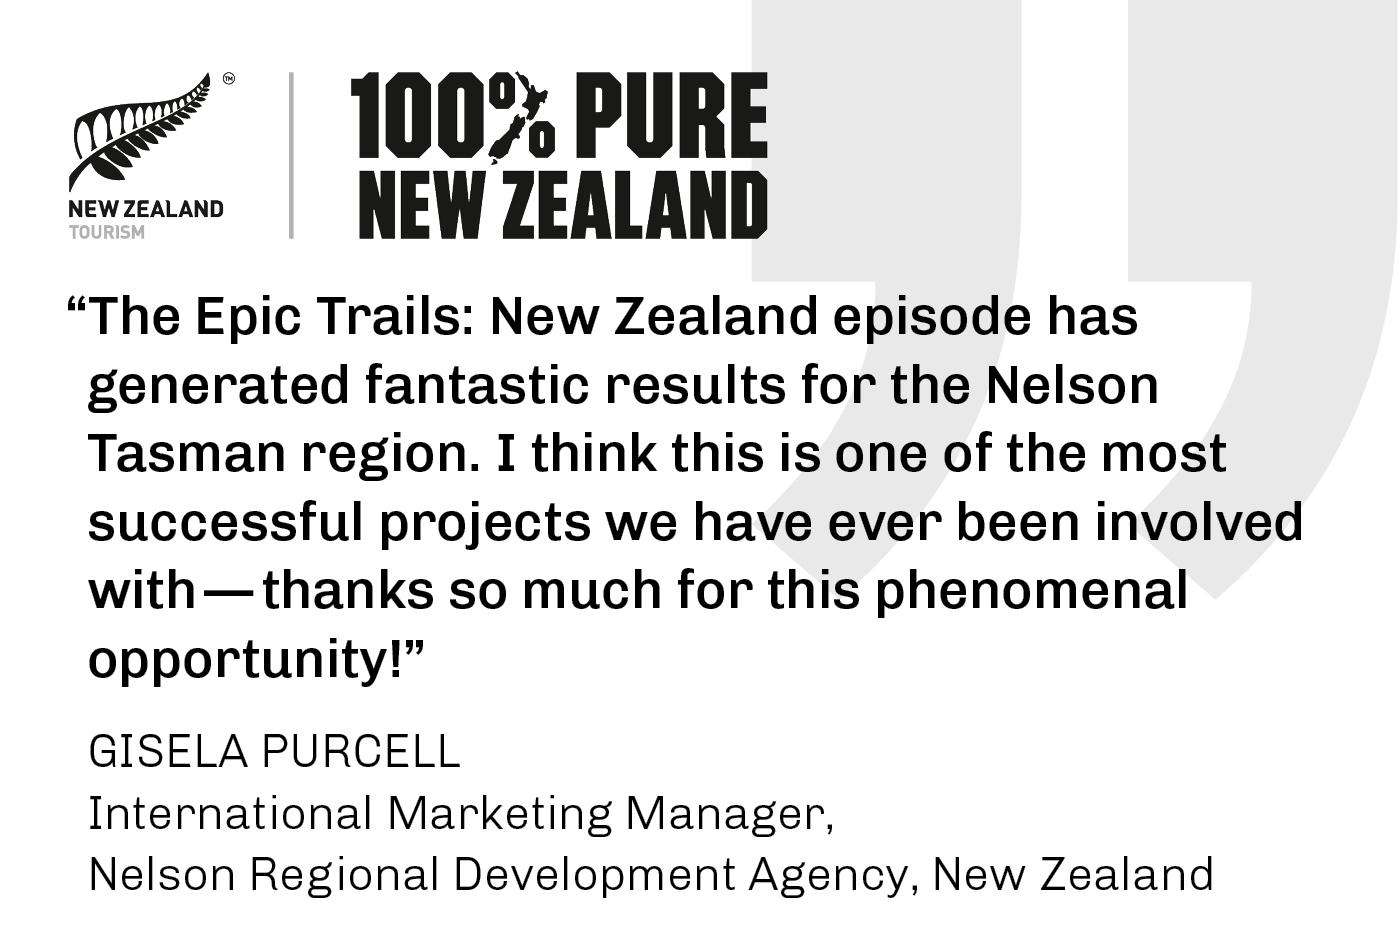 100% Pure New Zealand - Testimonial